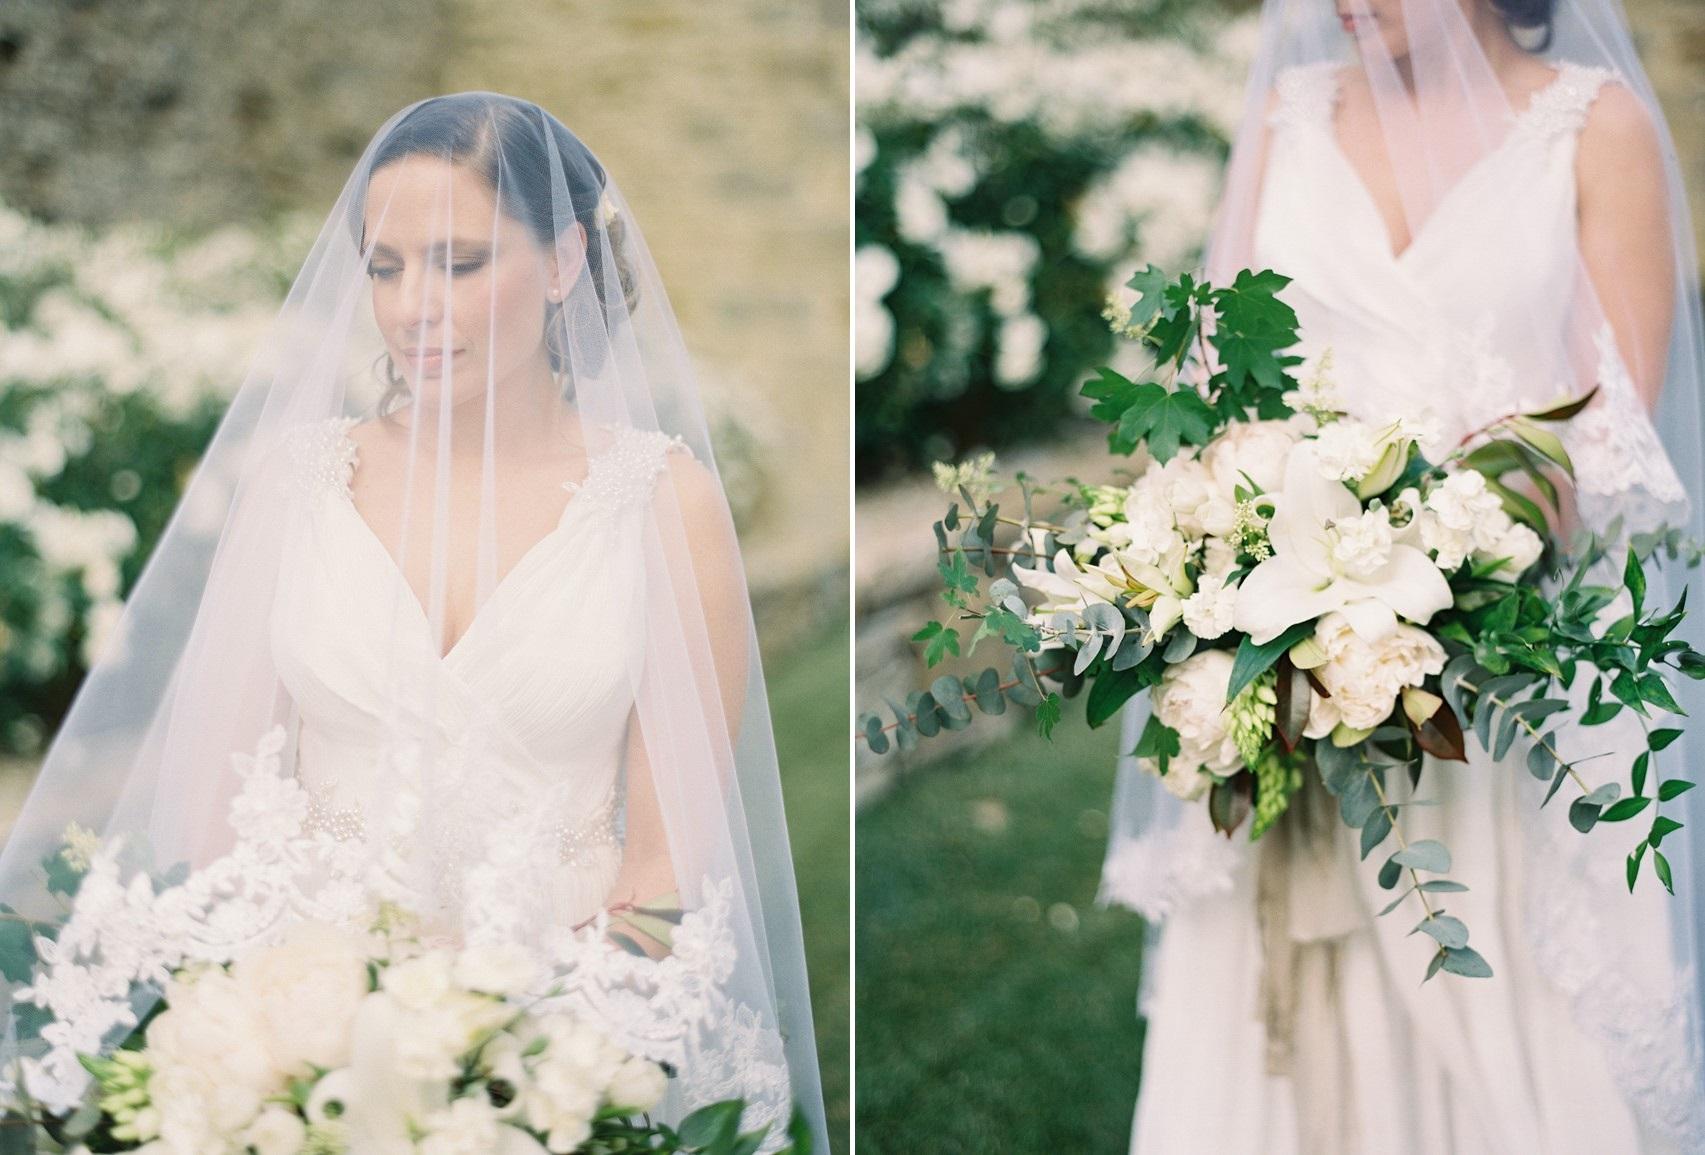 Greenery & White Bridal Bouquet